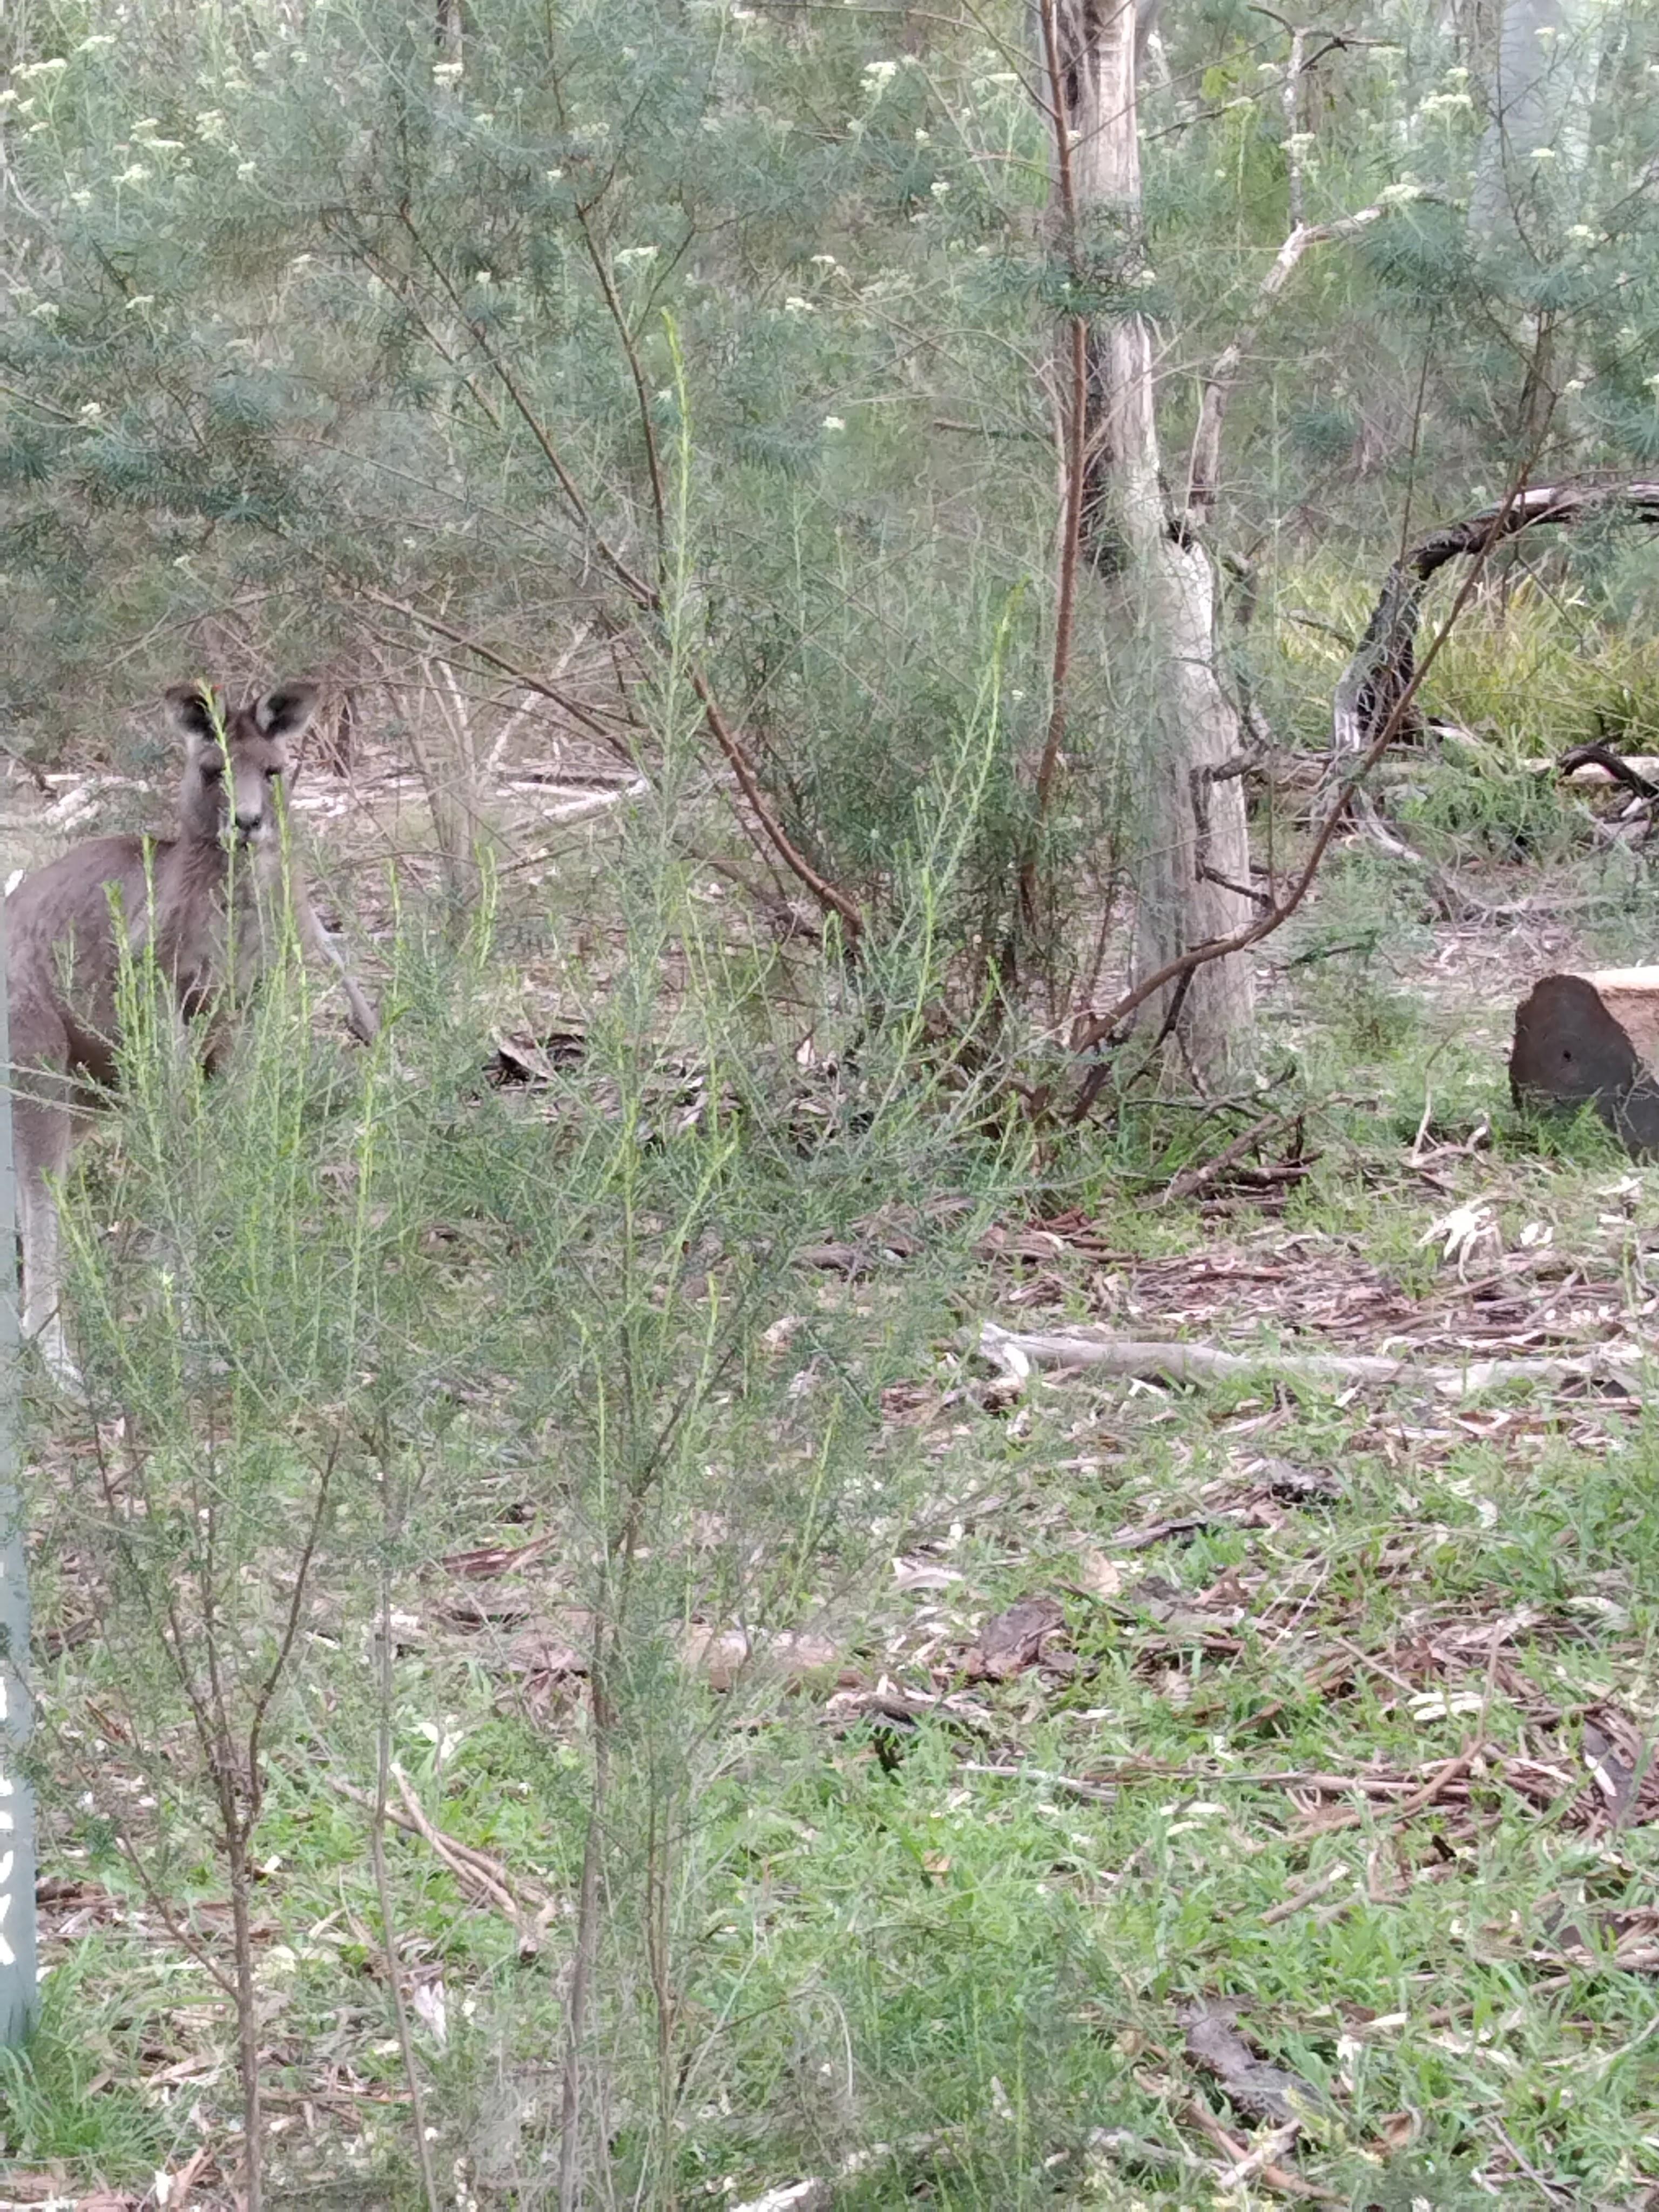 Kangaroo in scrubland